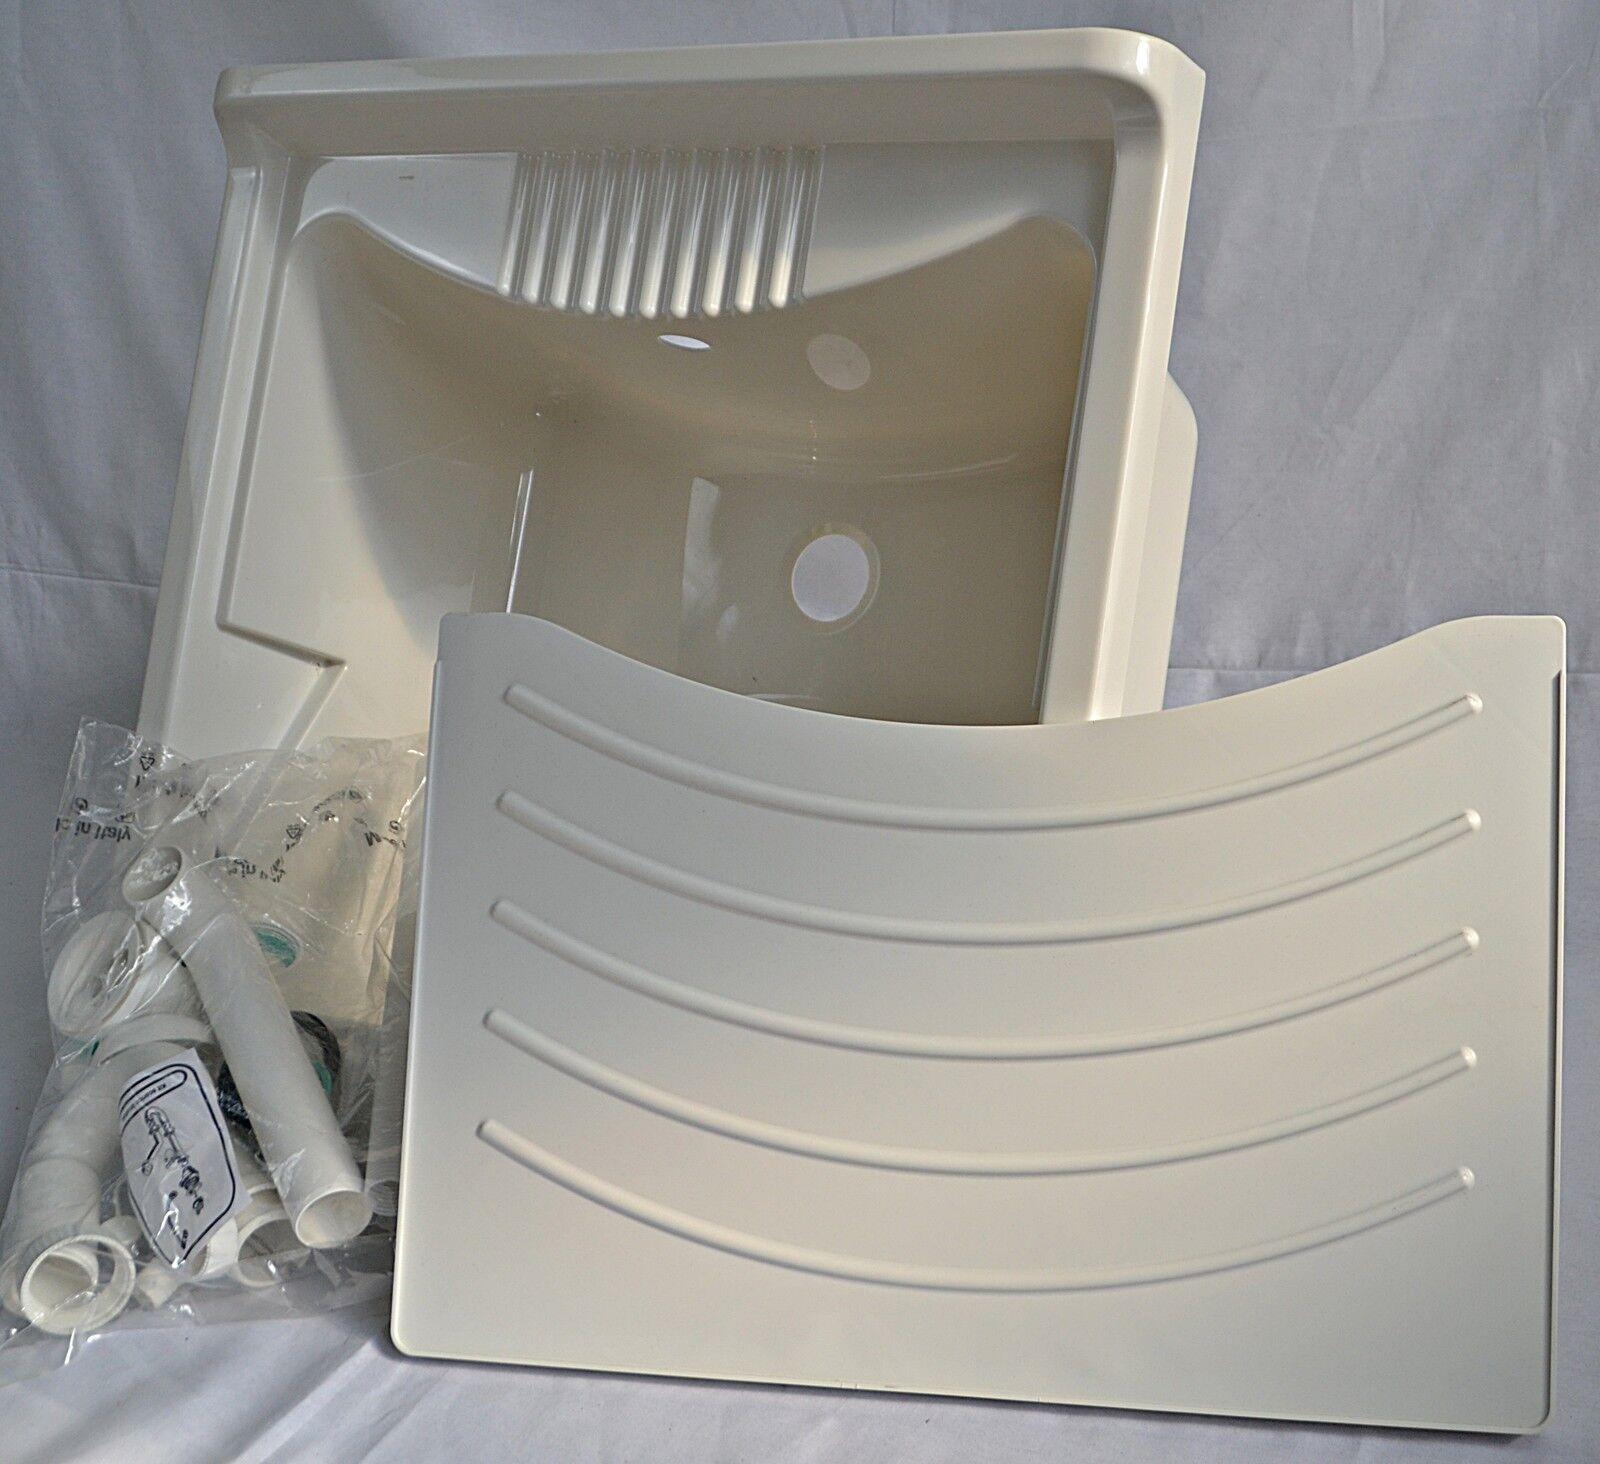 Negrari 6007sk-fregadero lavabos blancoo,  60 x 60 x 85h cm (sb23)  comprar mejor